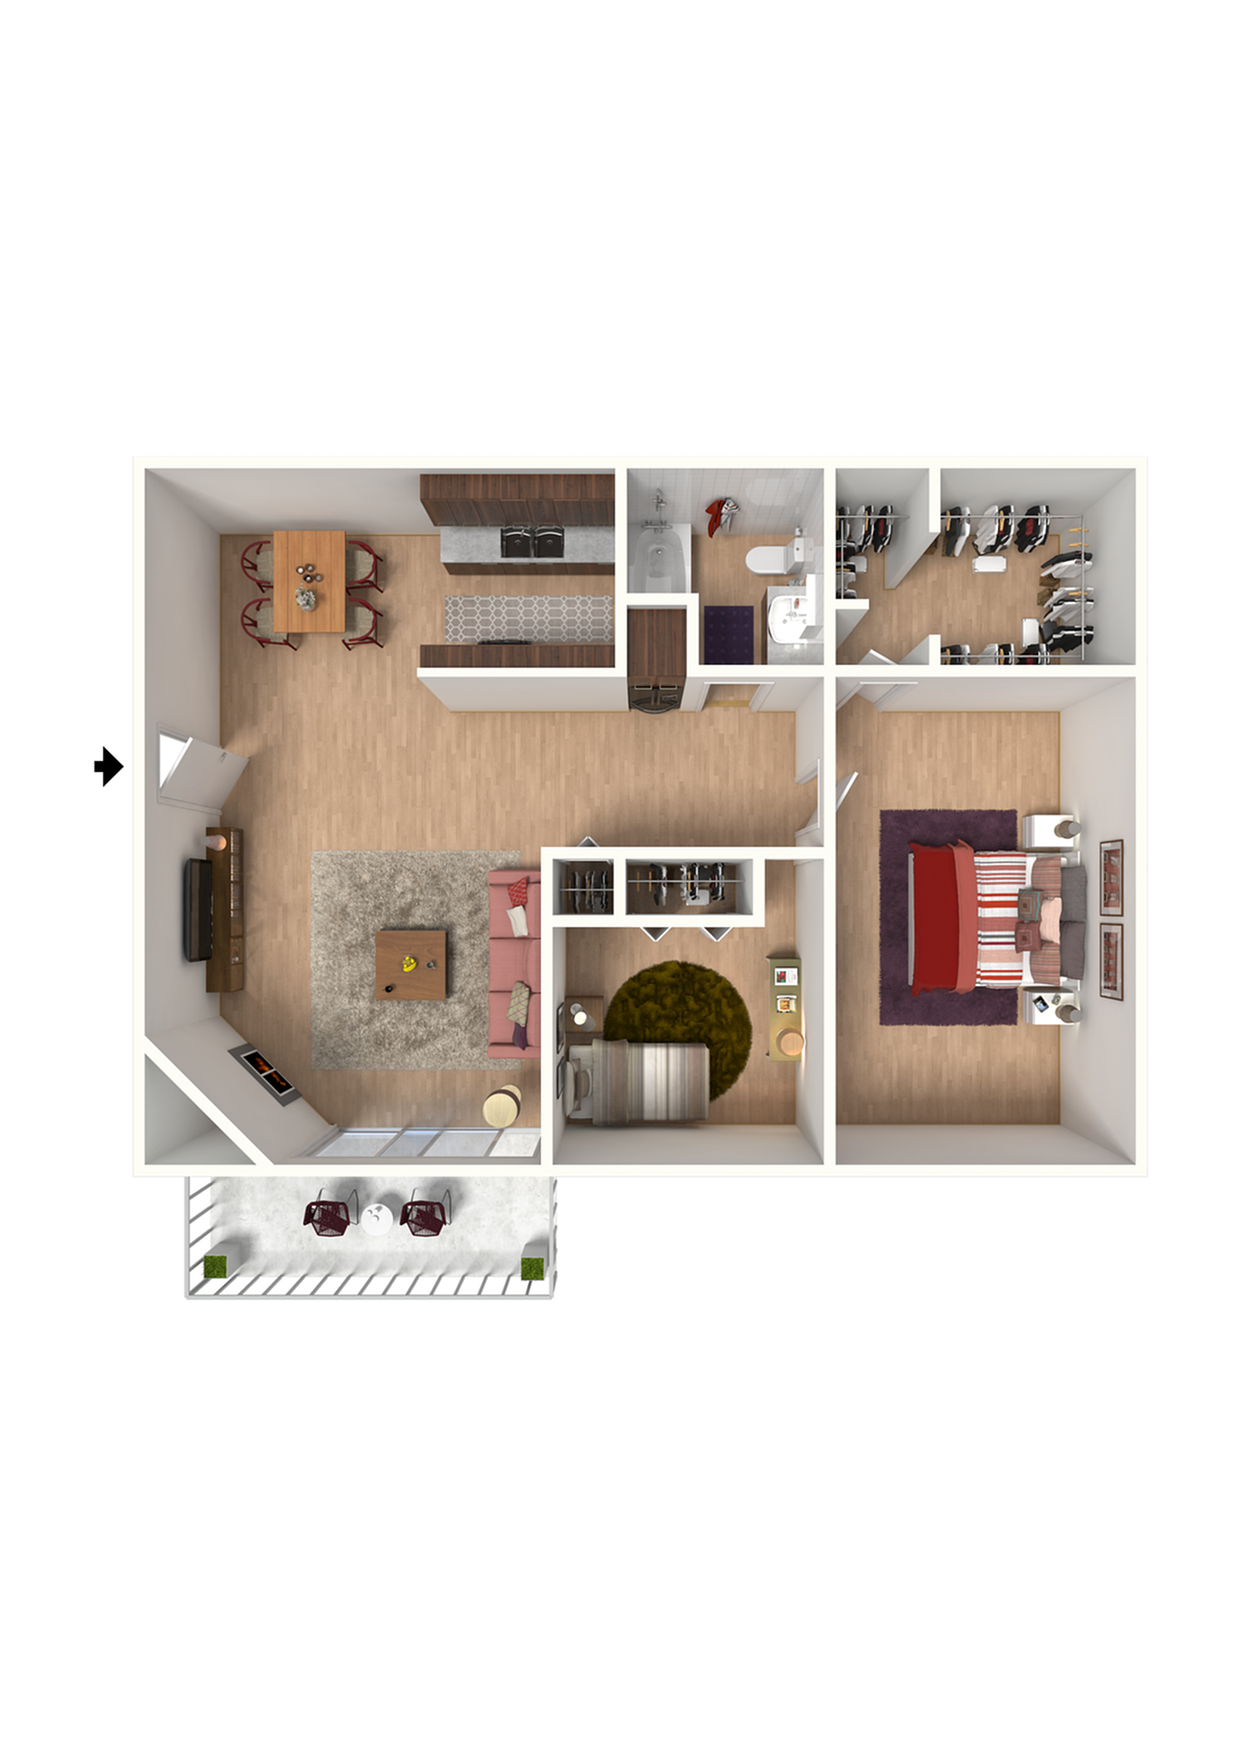 B1 Floorplan: 2 Bedroom, 1 Bathroom - 912 sqft